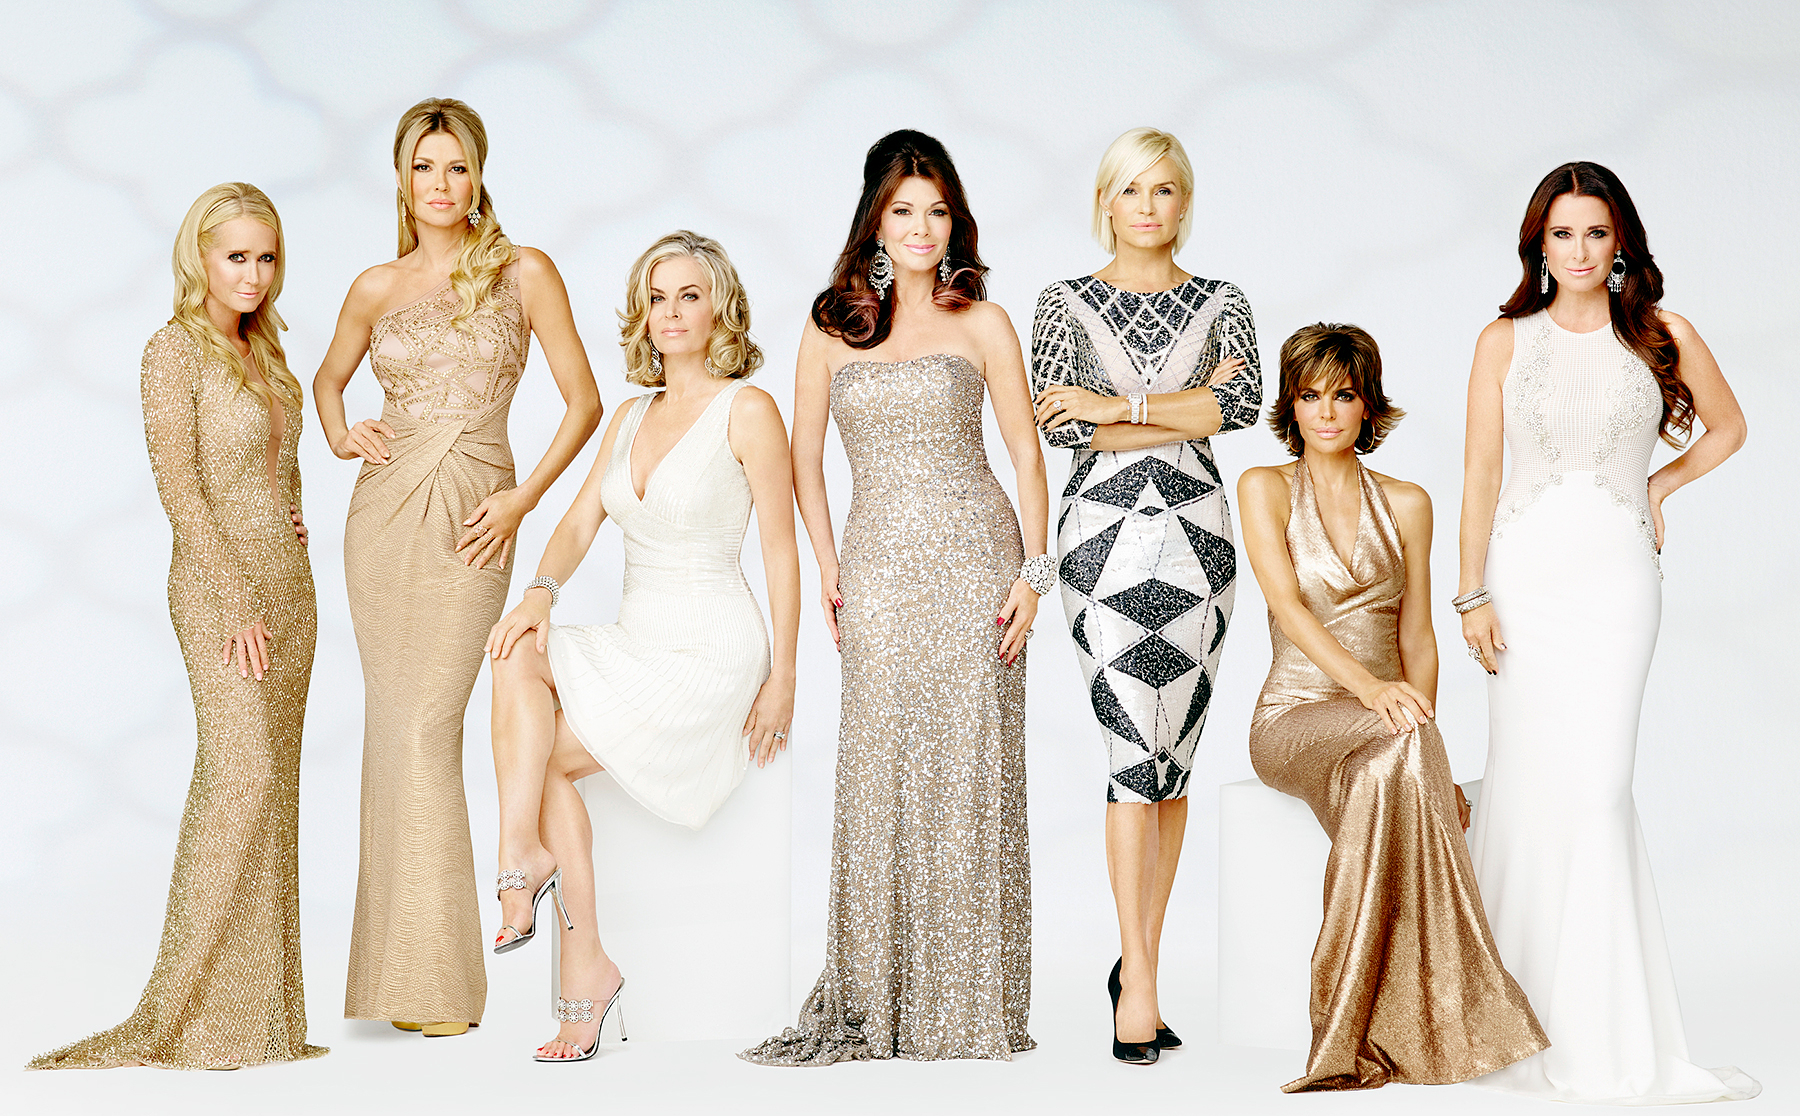 Kim Richards, Brandi Glanville, Eileen Davidson, Lisa Vanderpump, Yolanda H. Foster, Lisa Rinna, and Kyle Richards on The Real Housewives Of Beverly Hills